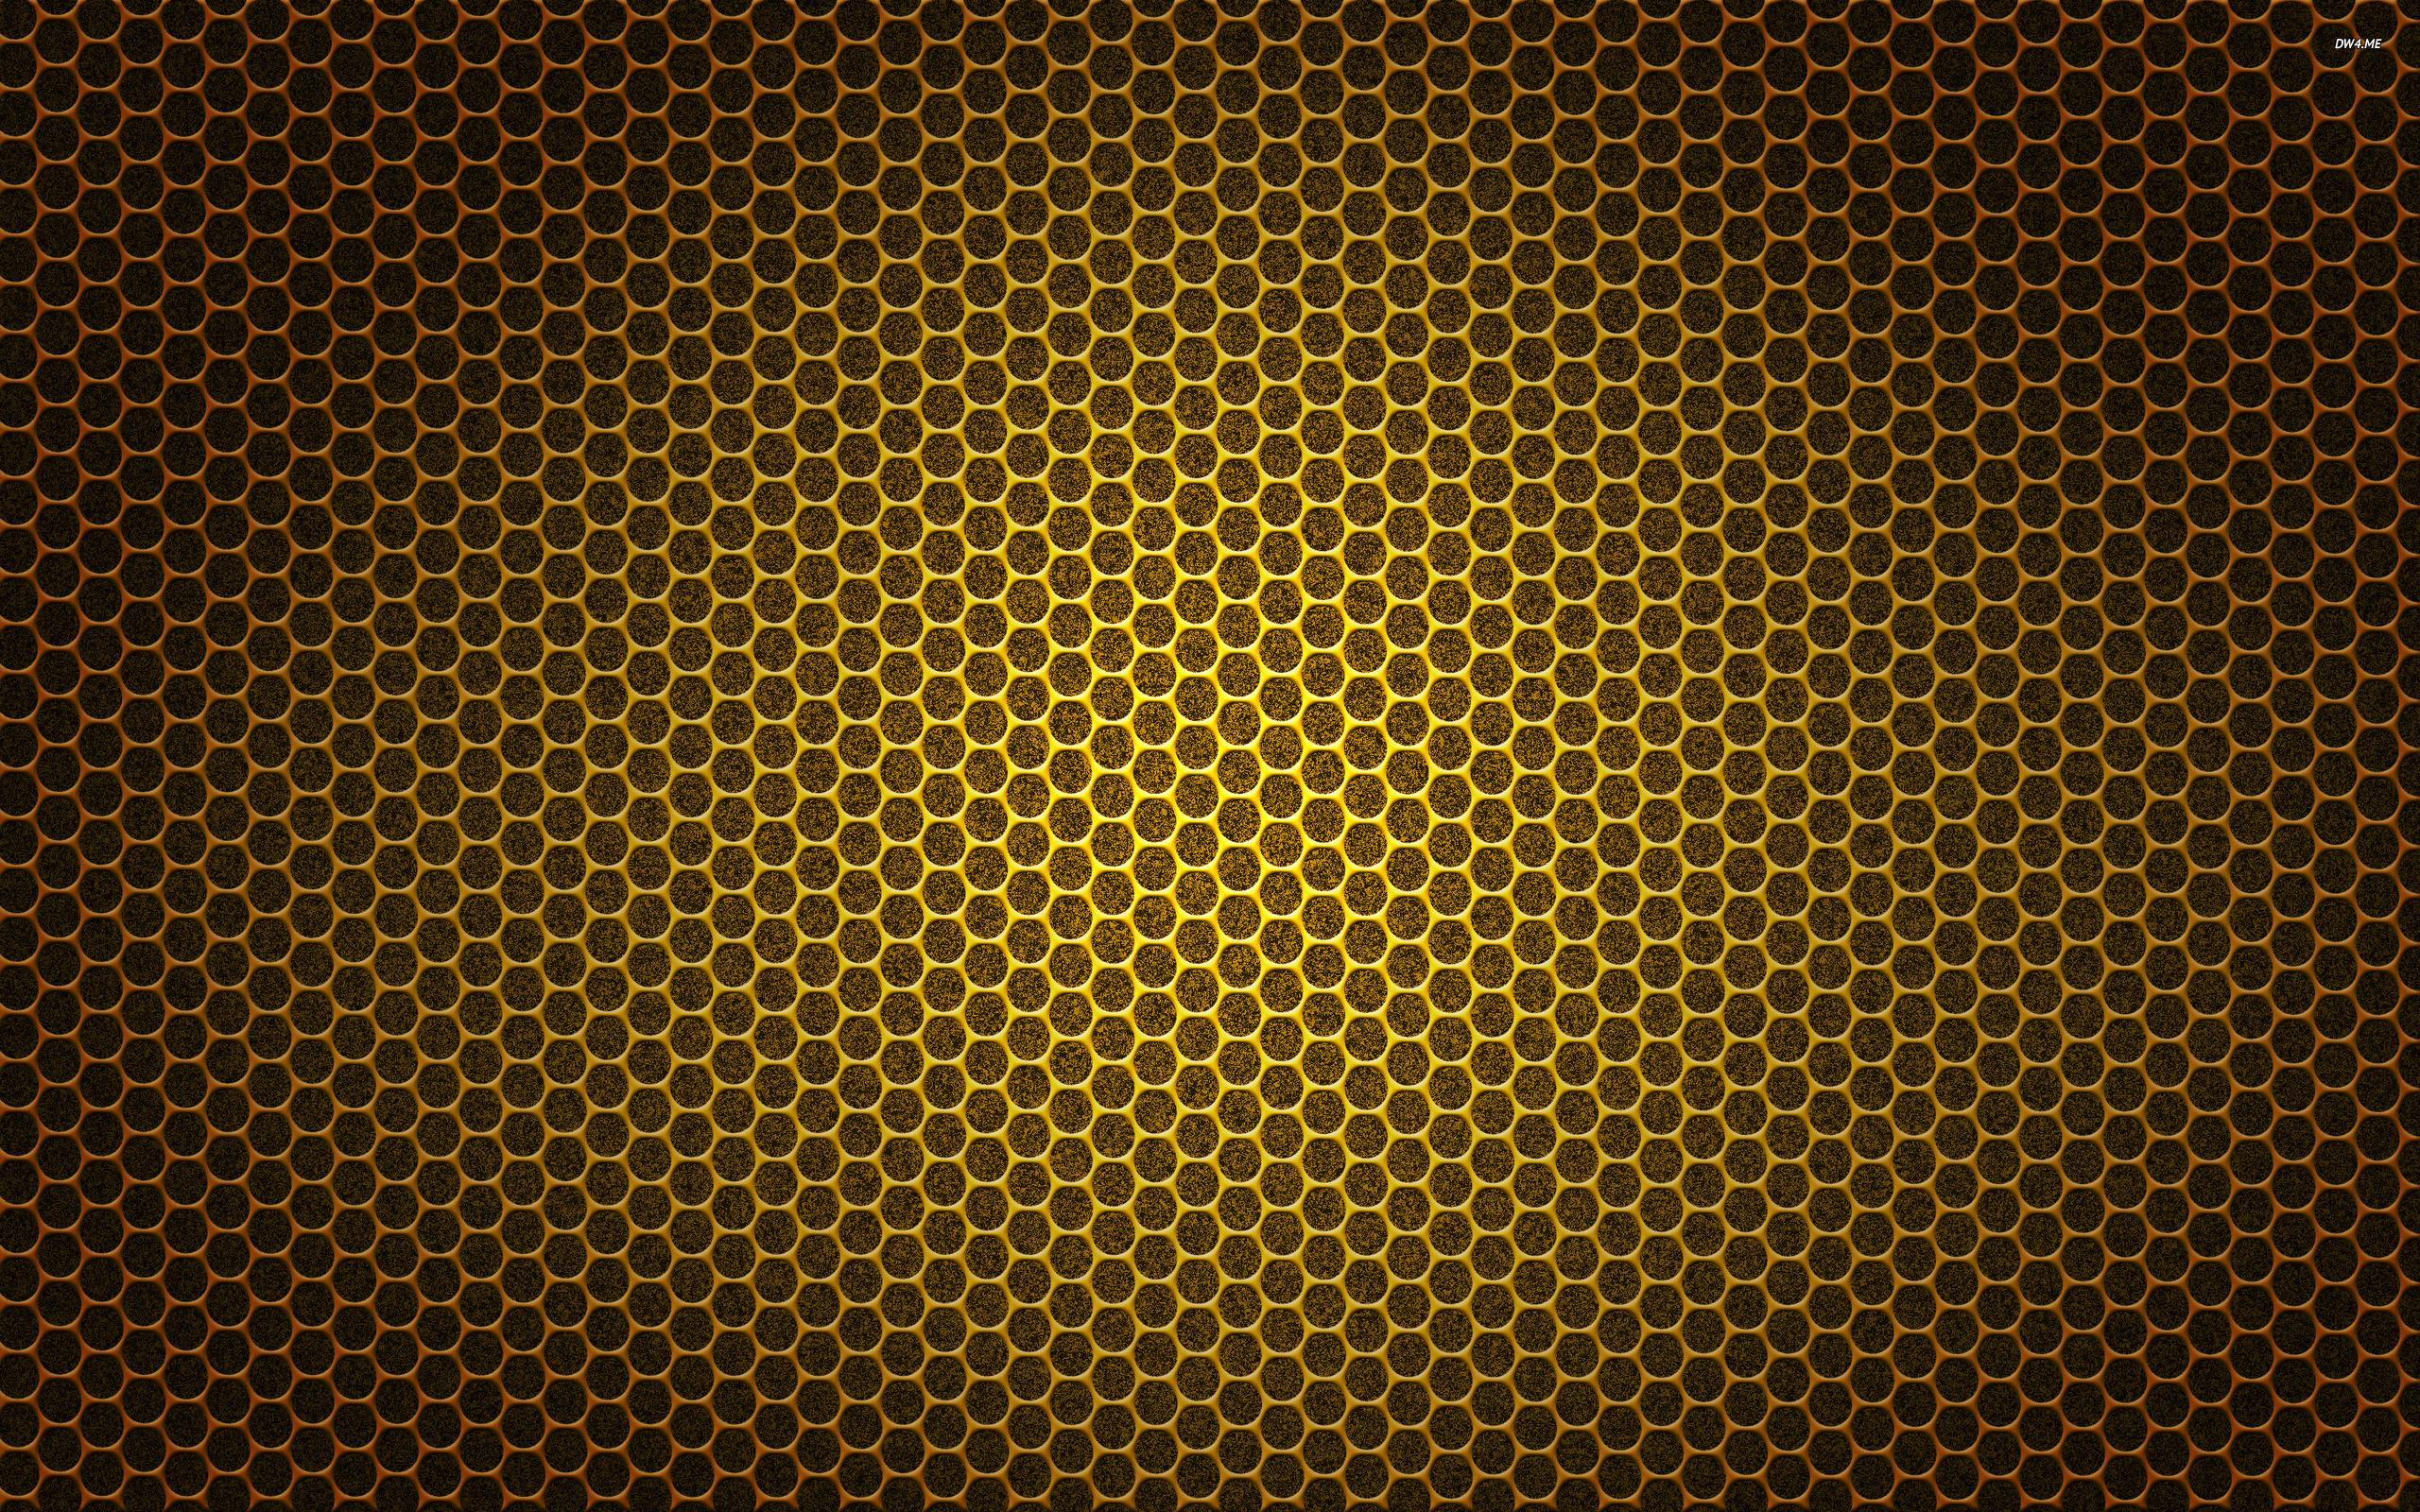 49 Golden Wallpaper Hd On Wallpapersafari